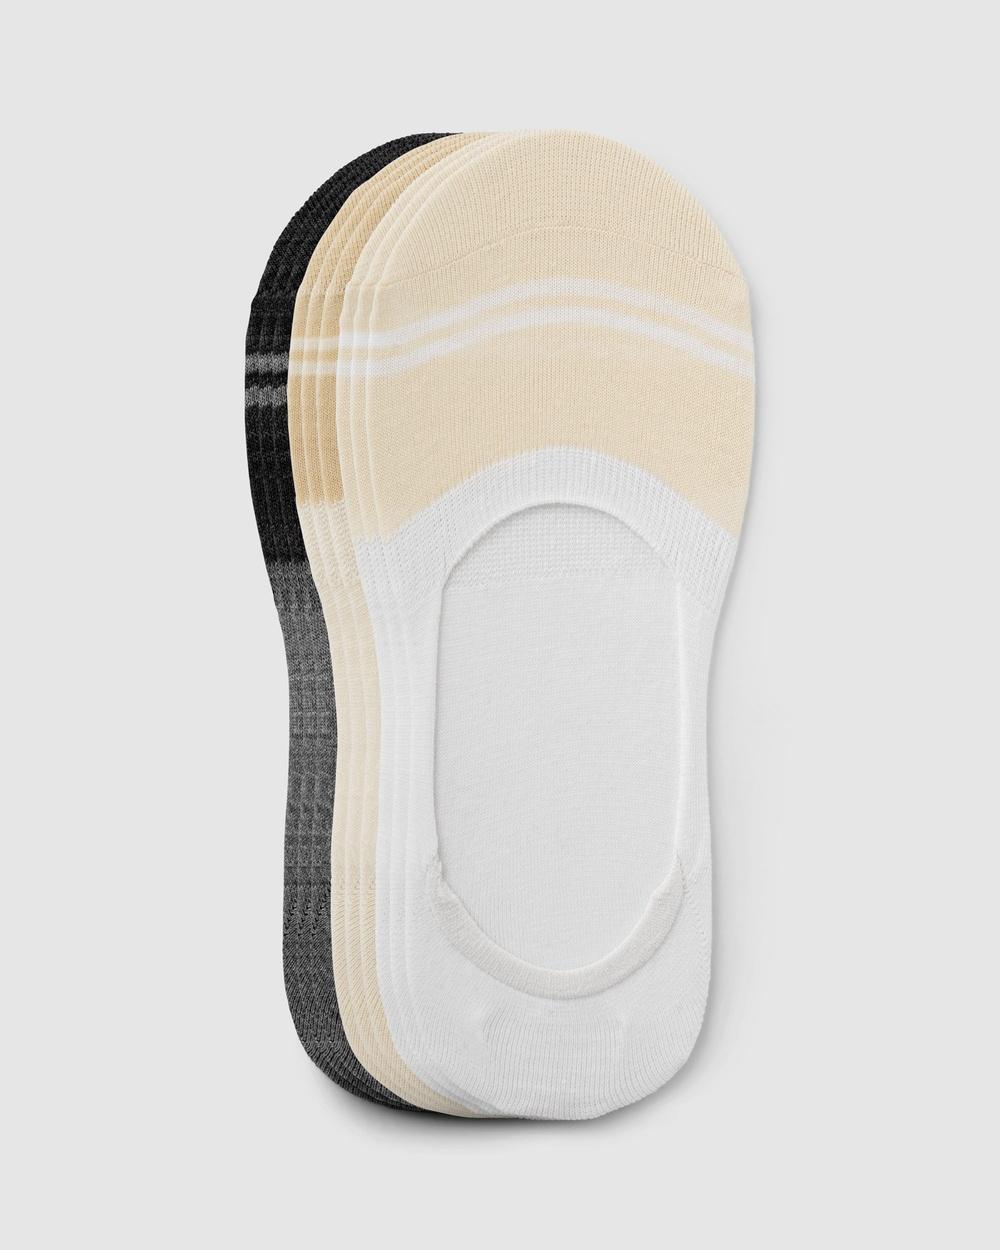 Sockdaily True Invis No Show Socks 9 Pack Multi